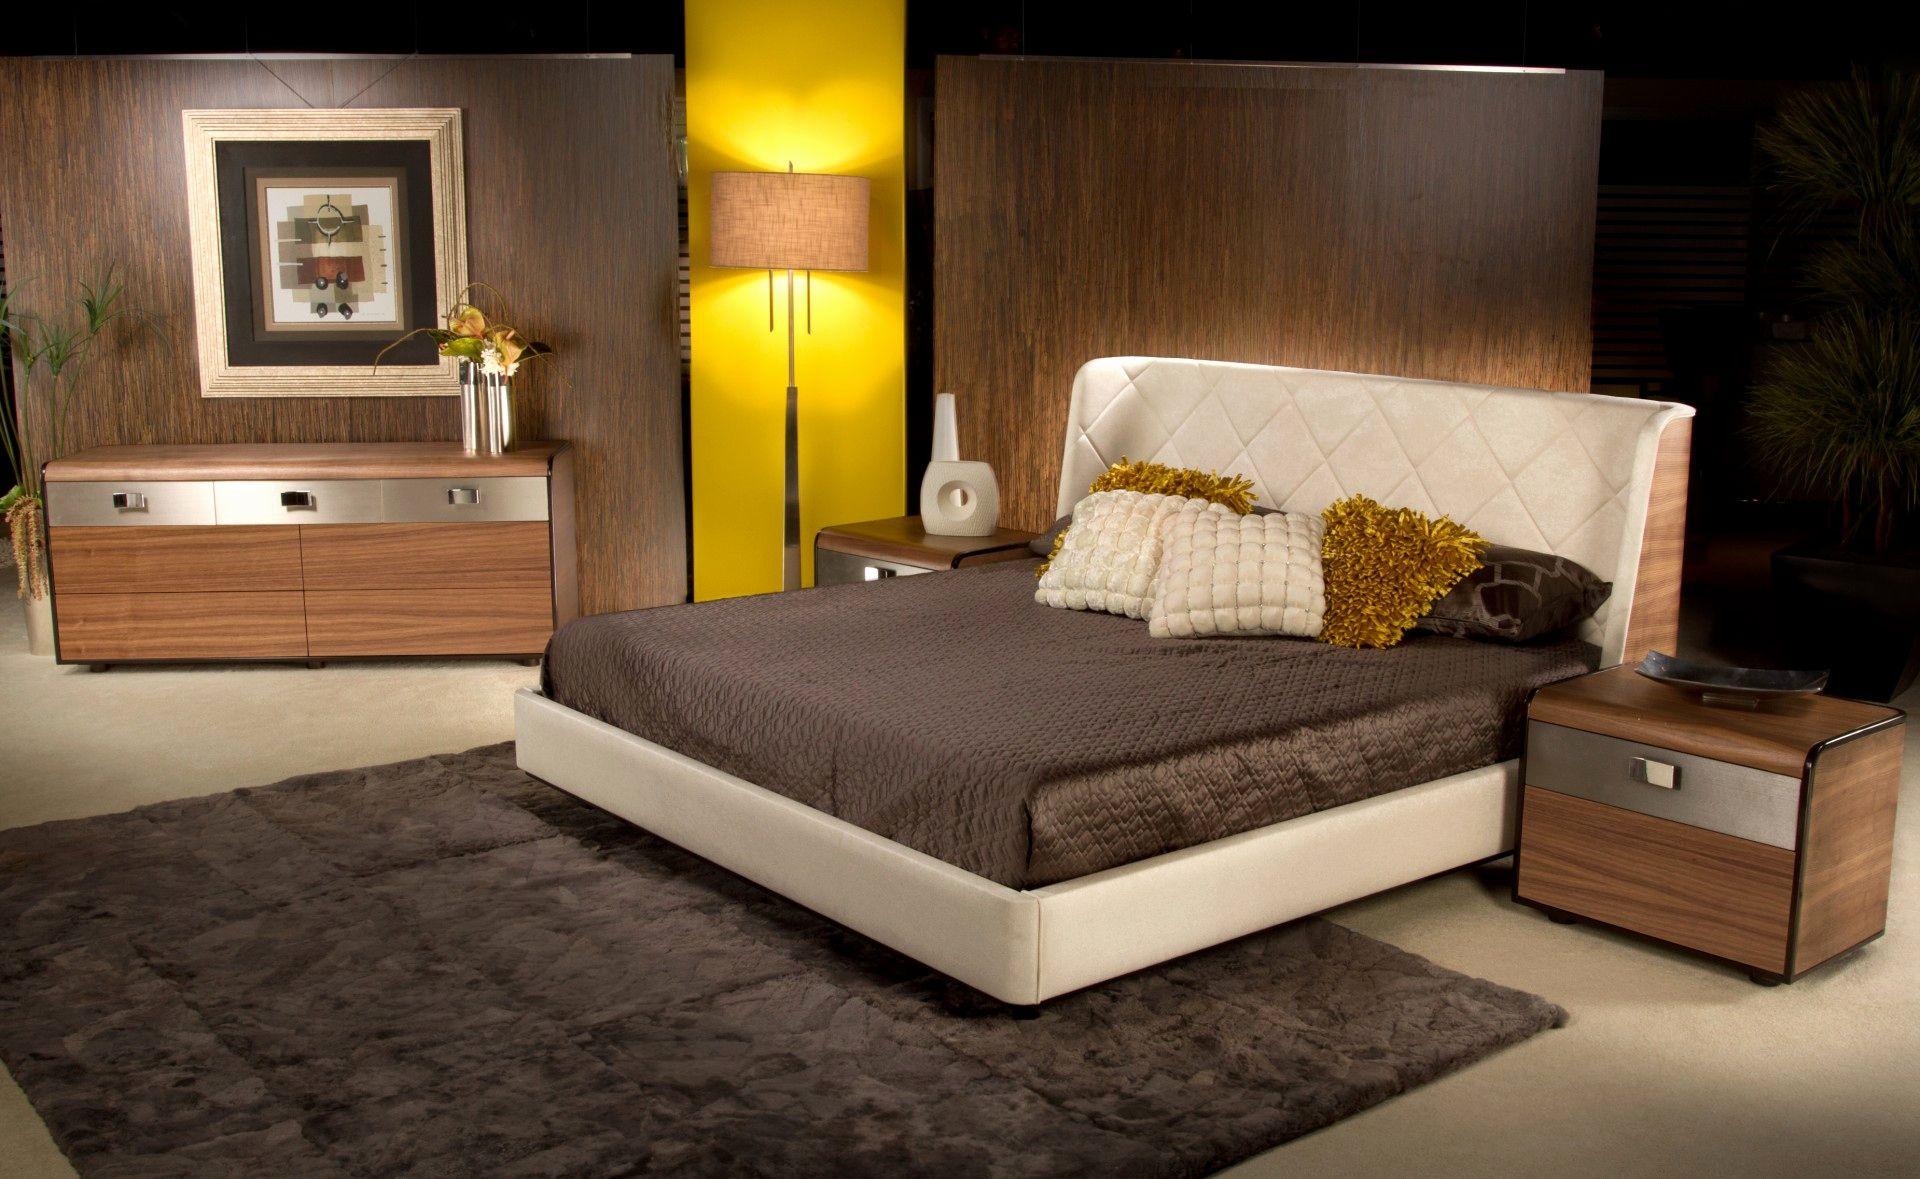 Elegant Sleek Sofa Set Designs Photograpy Sleek Sofa Set Designs Lovely  Sleek Wooden Sofa Designs Great